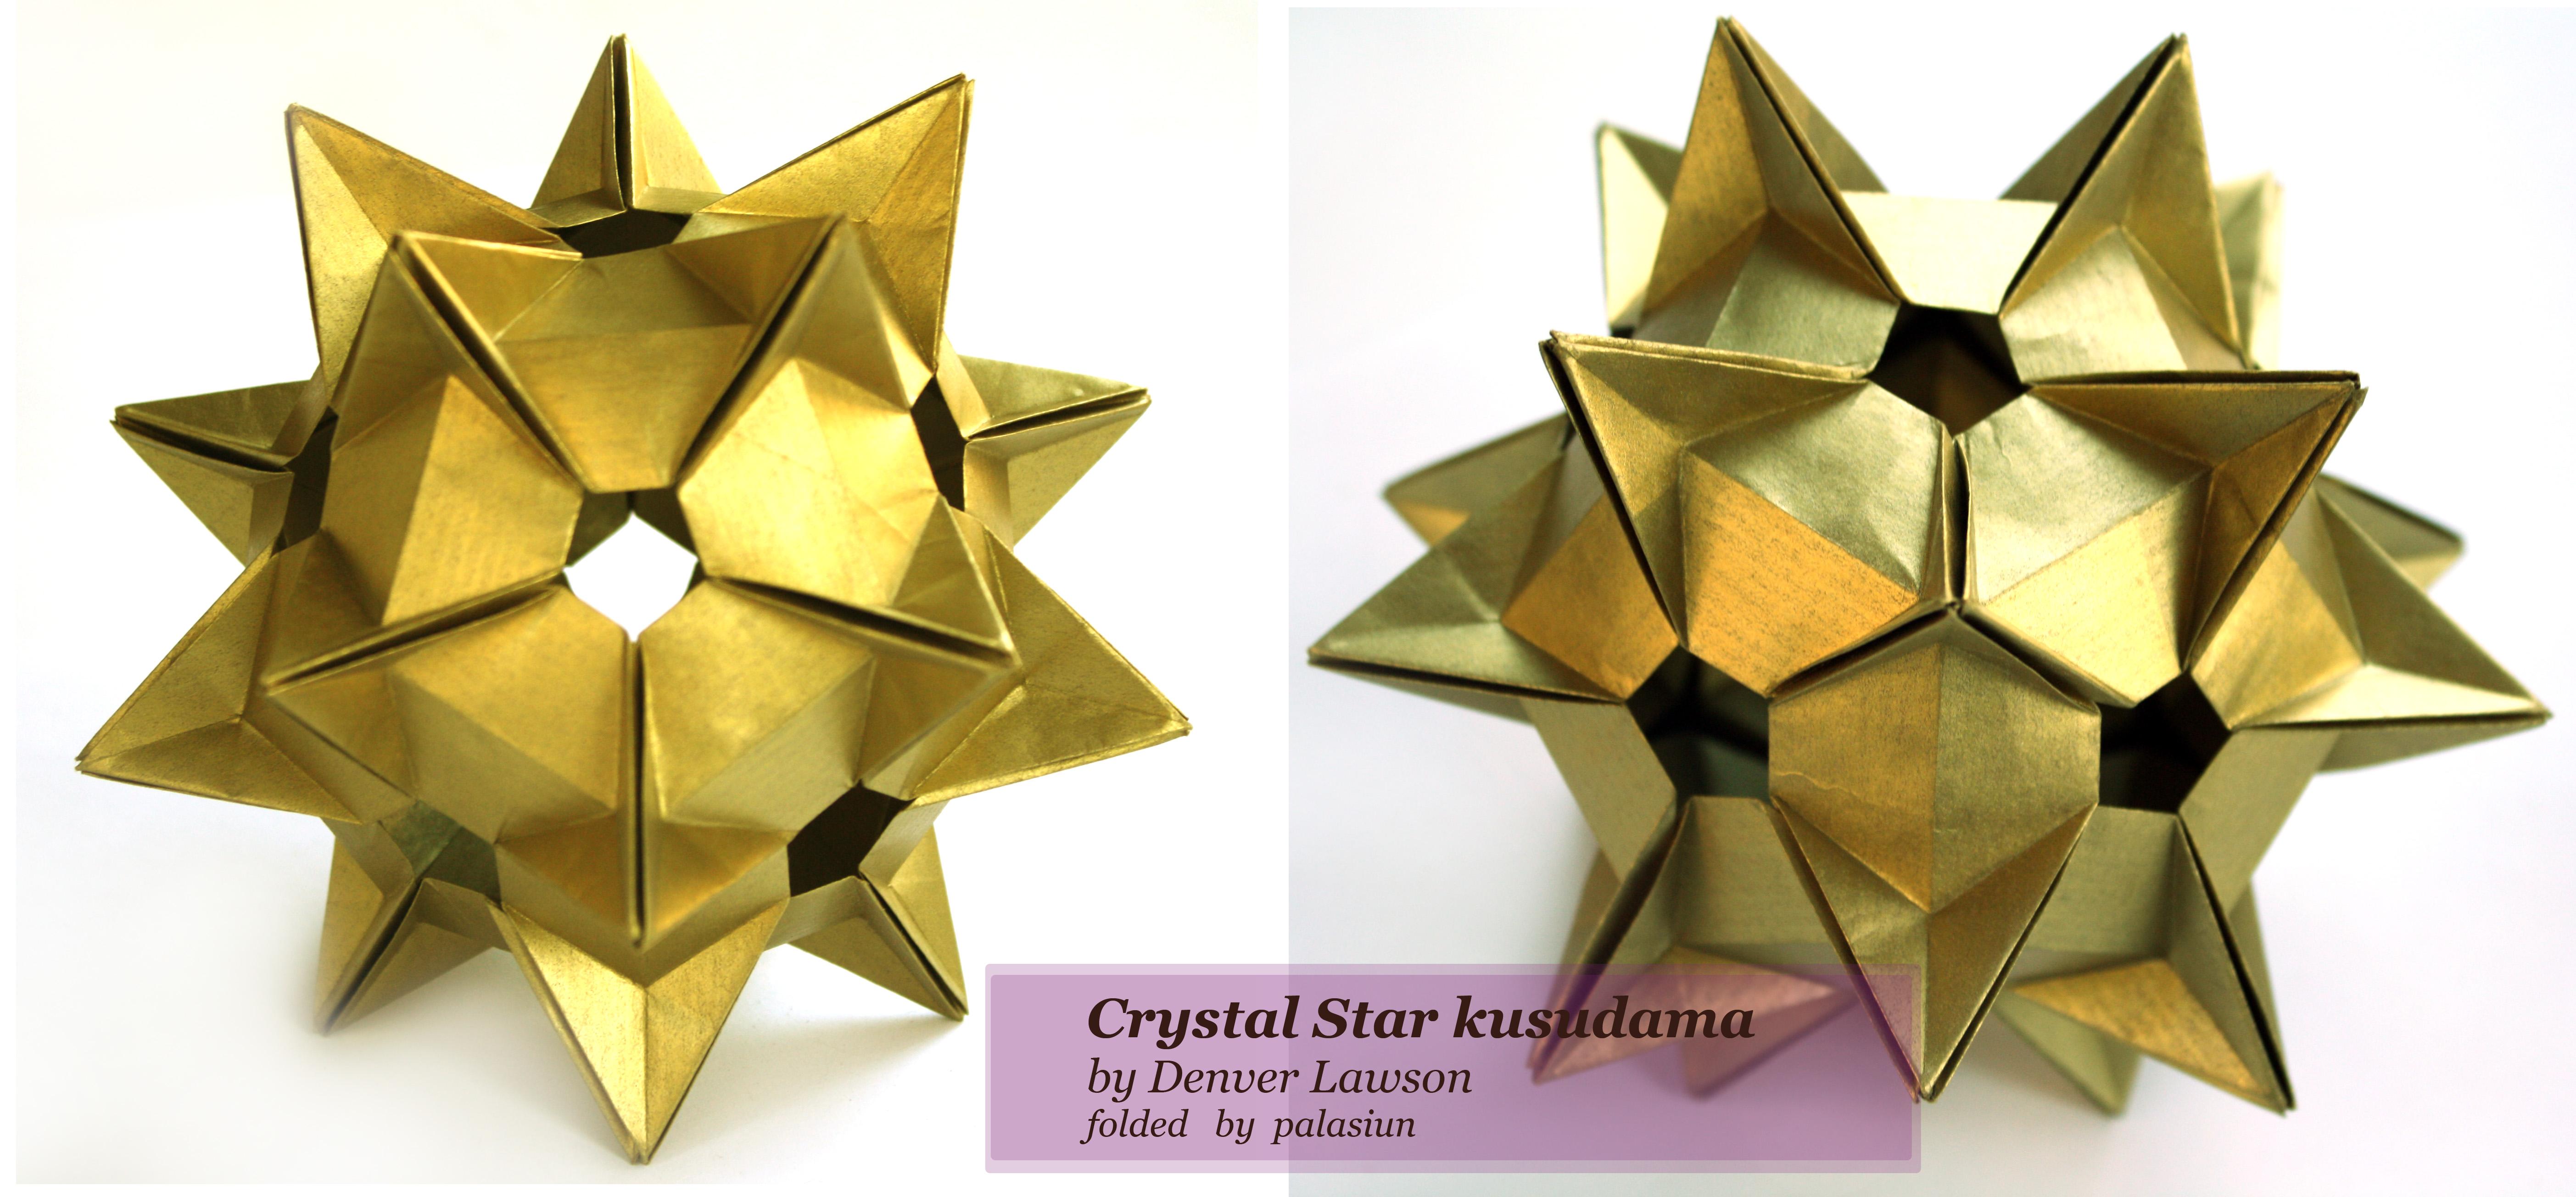 Crystal Star kusudama